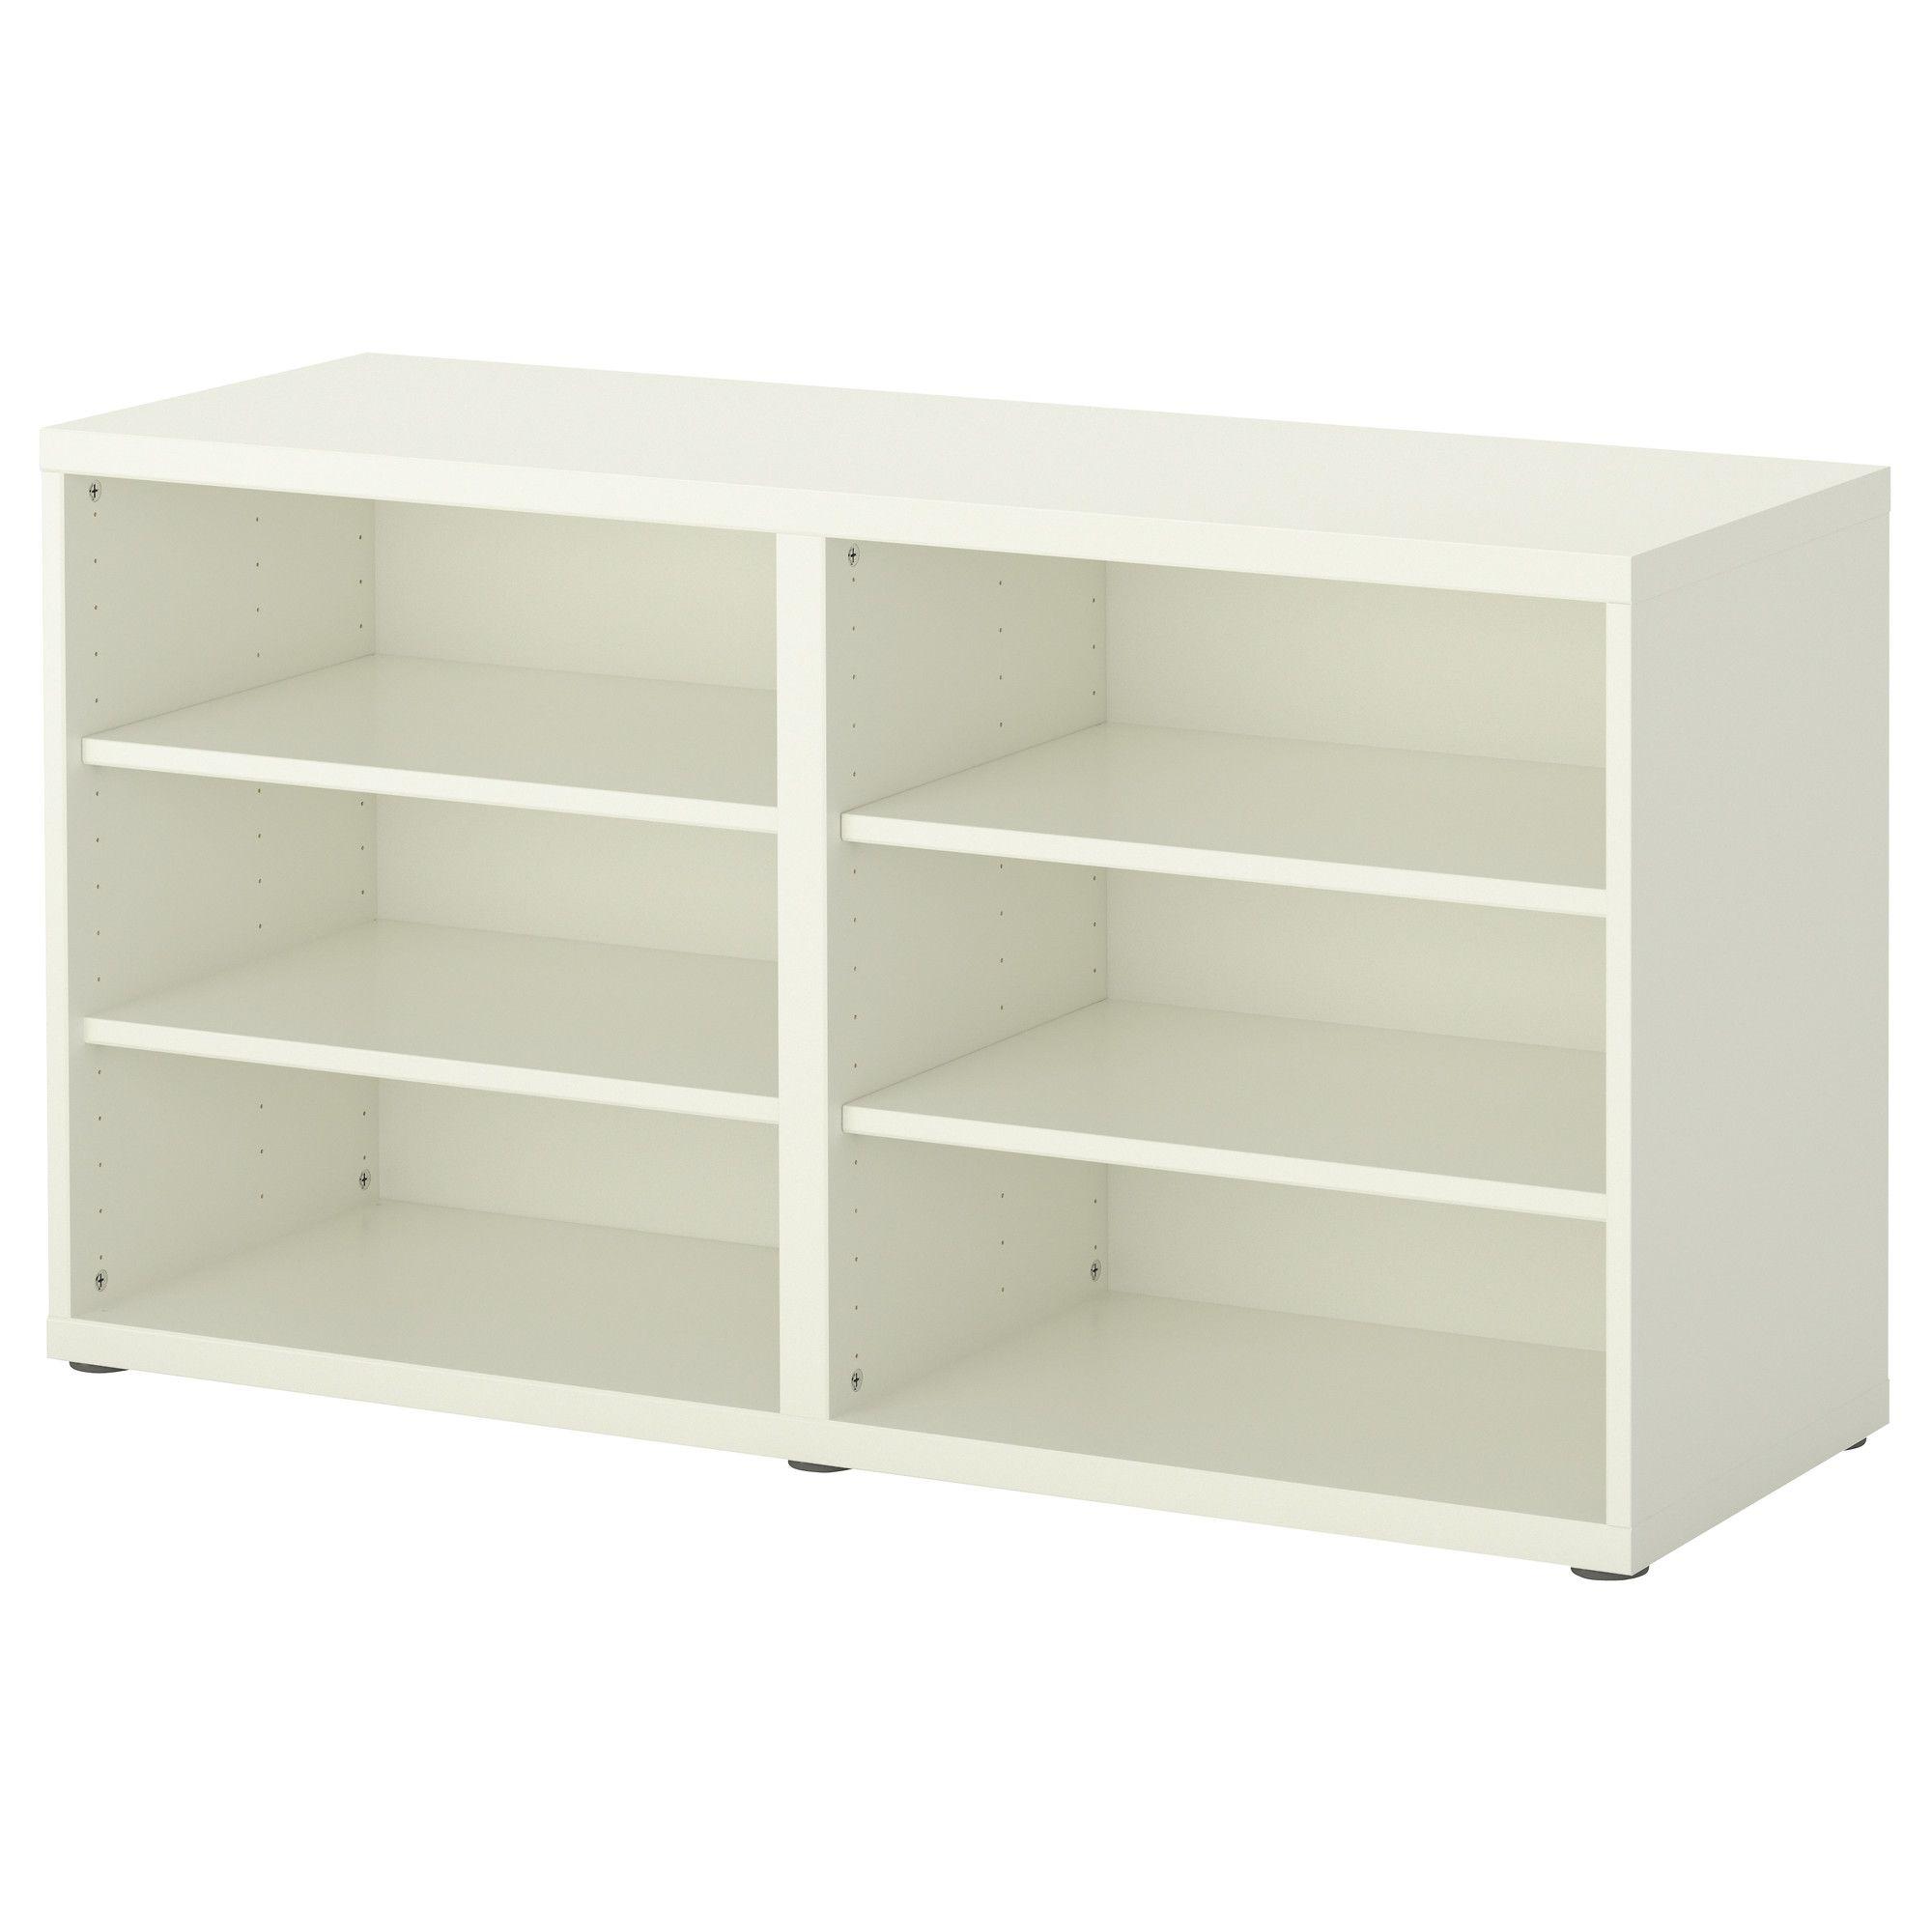 Ikea 2 Together For A: BESTÅ Shelf Unit/height Extension Unit